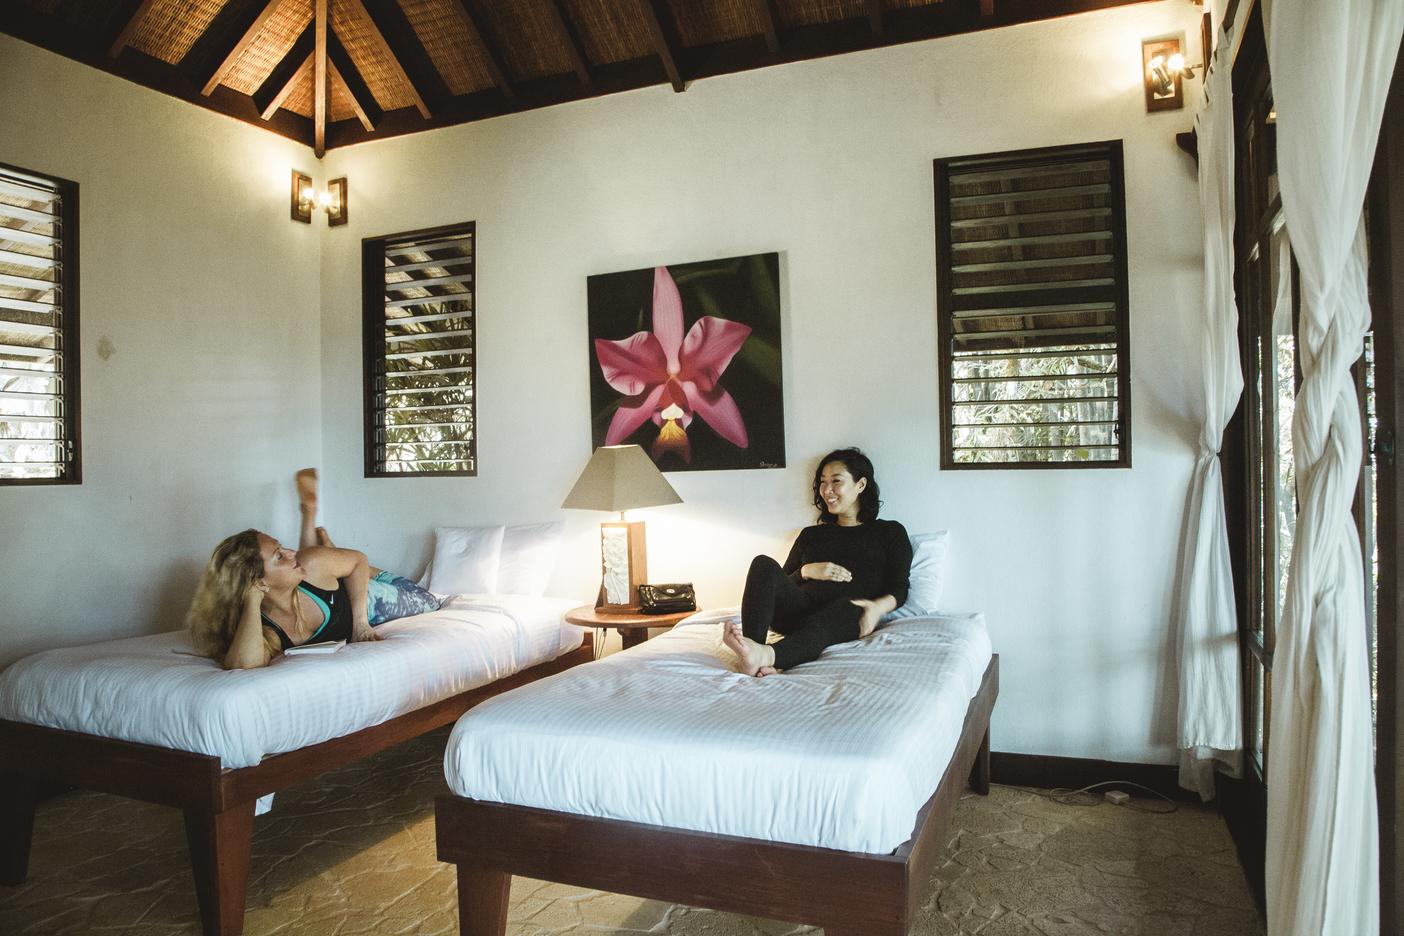 costa-rica-yoga-retreat-venue-experience-retreats-twin room.jpg